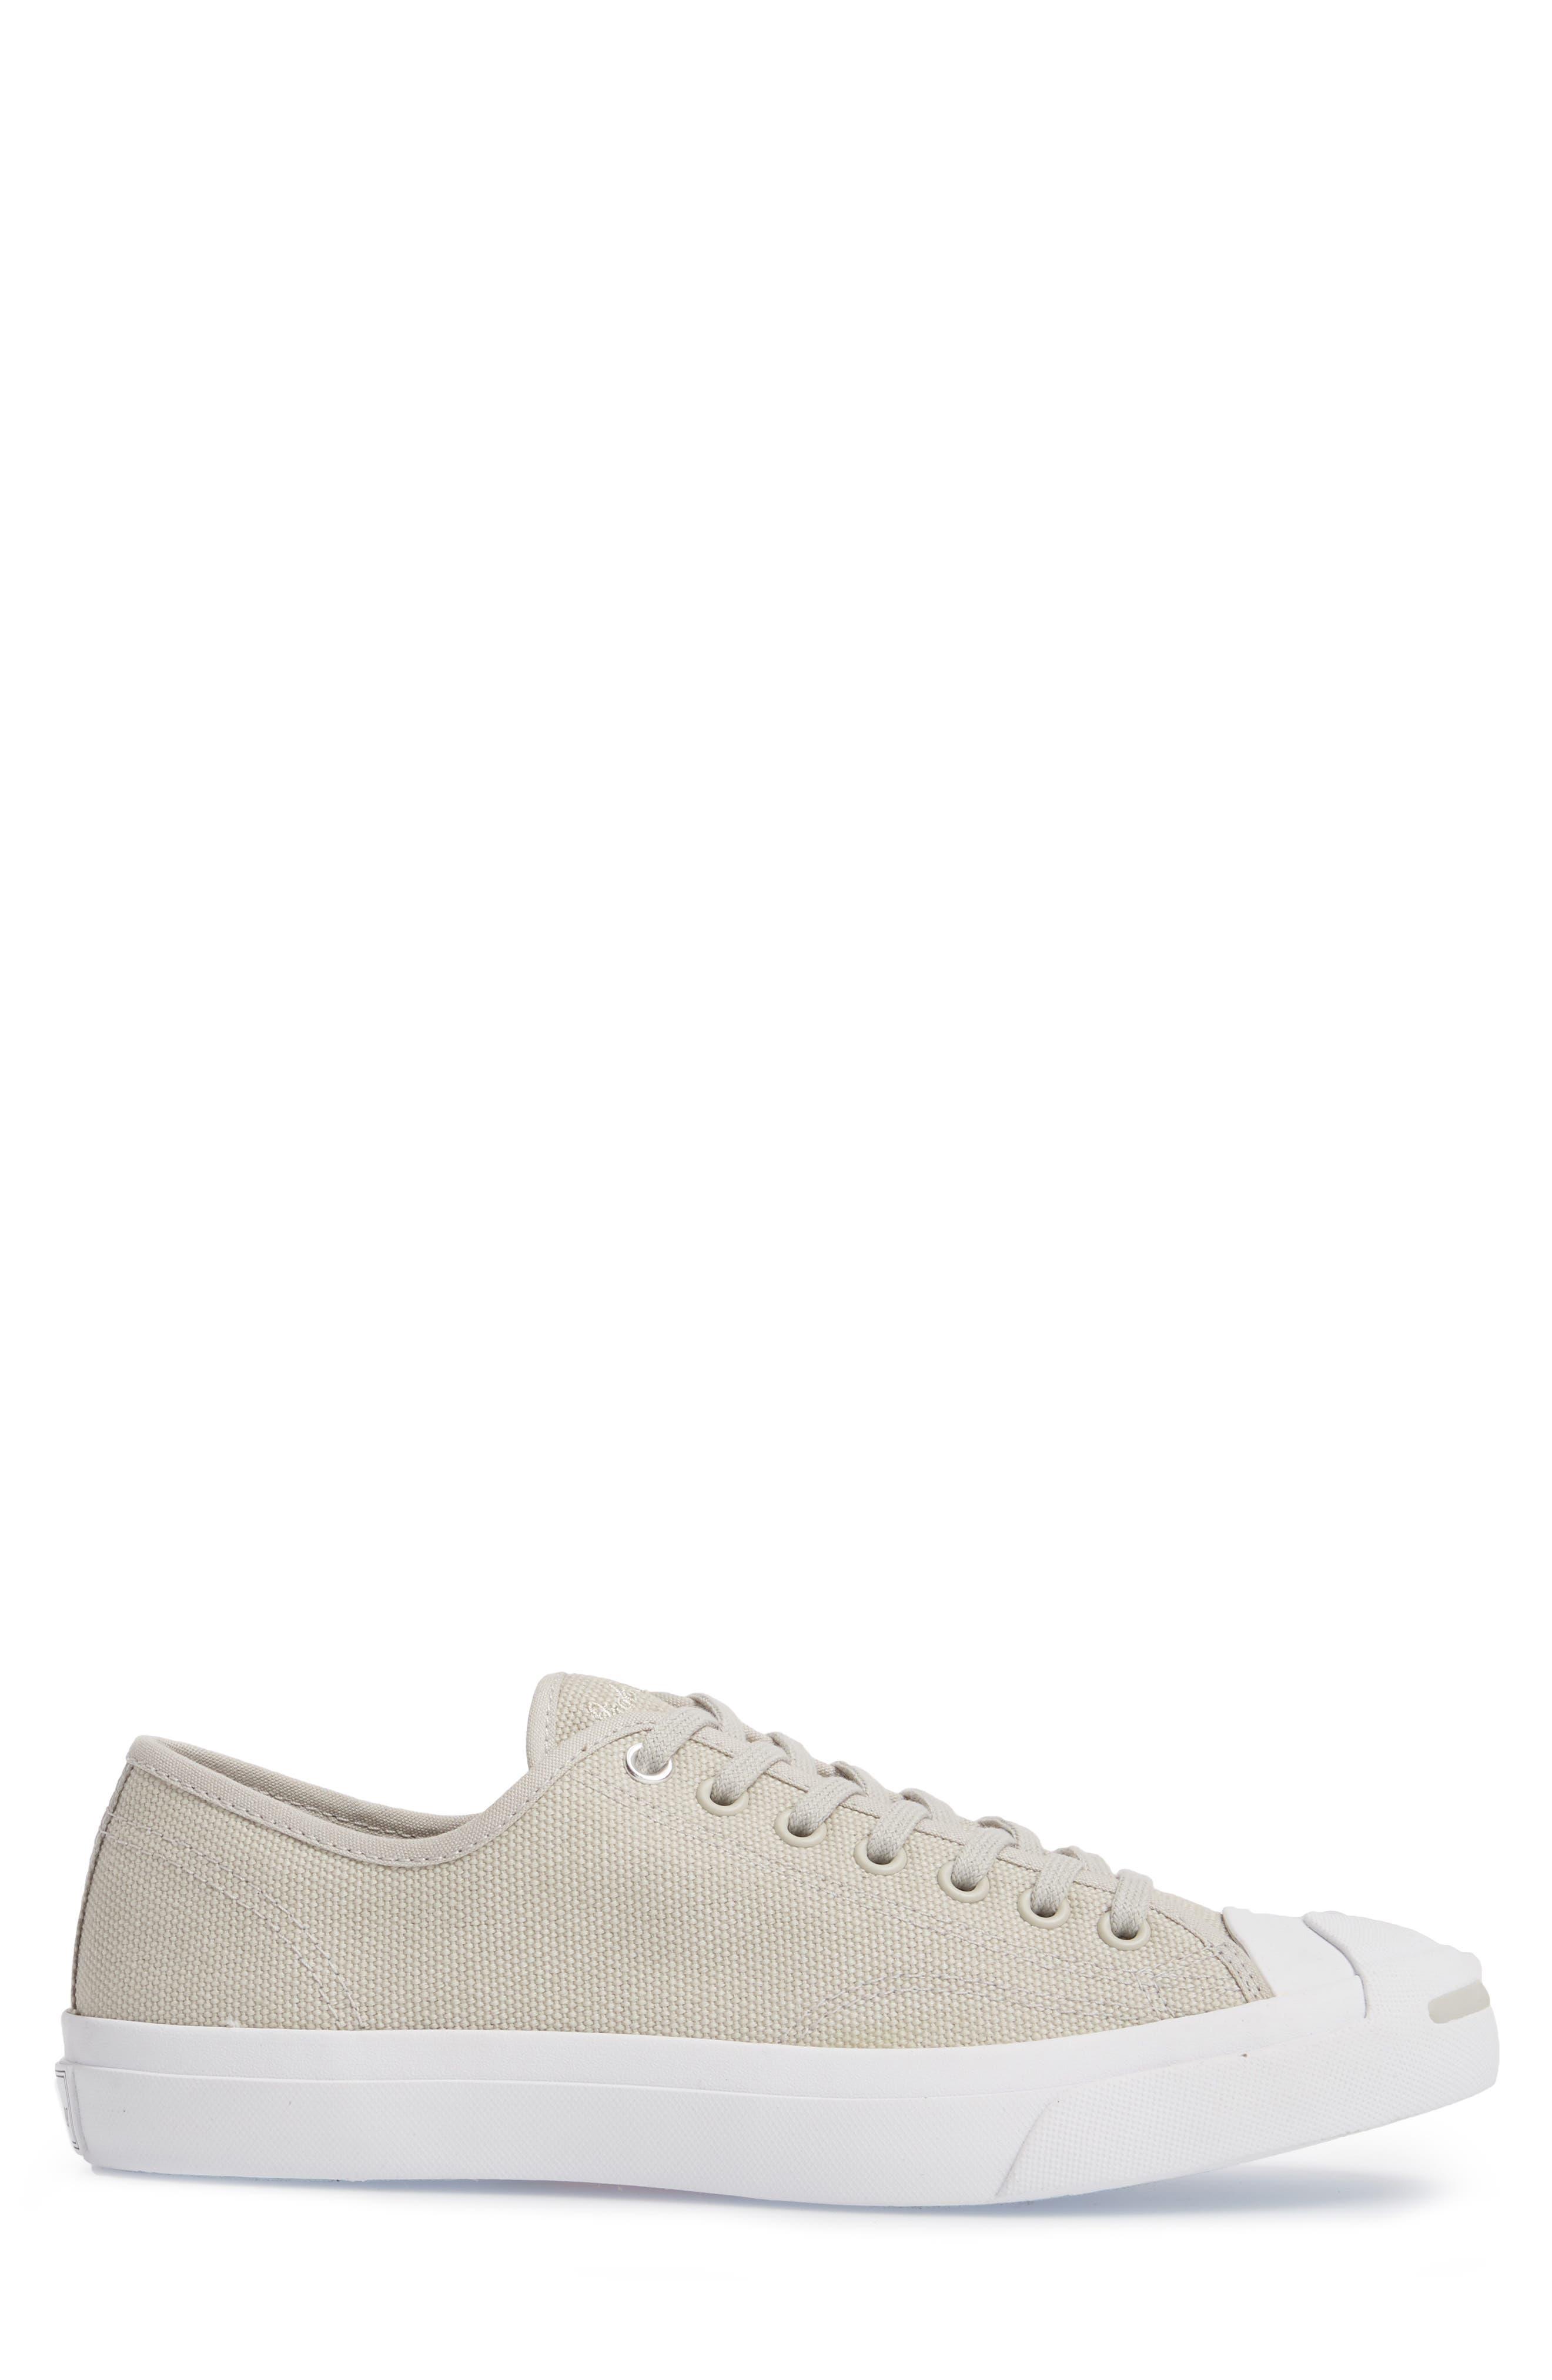 Jack Purcell Sneaker,                             Alternate thumbnail 3, color,                             026